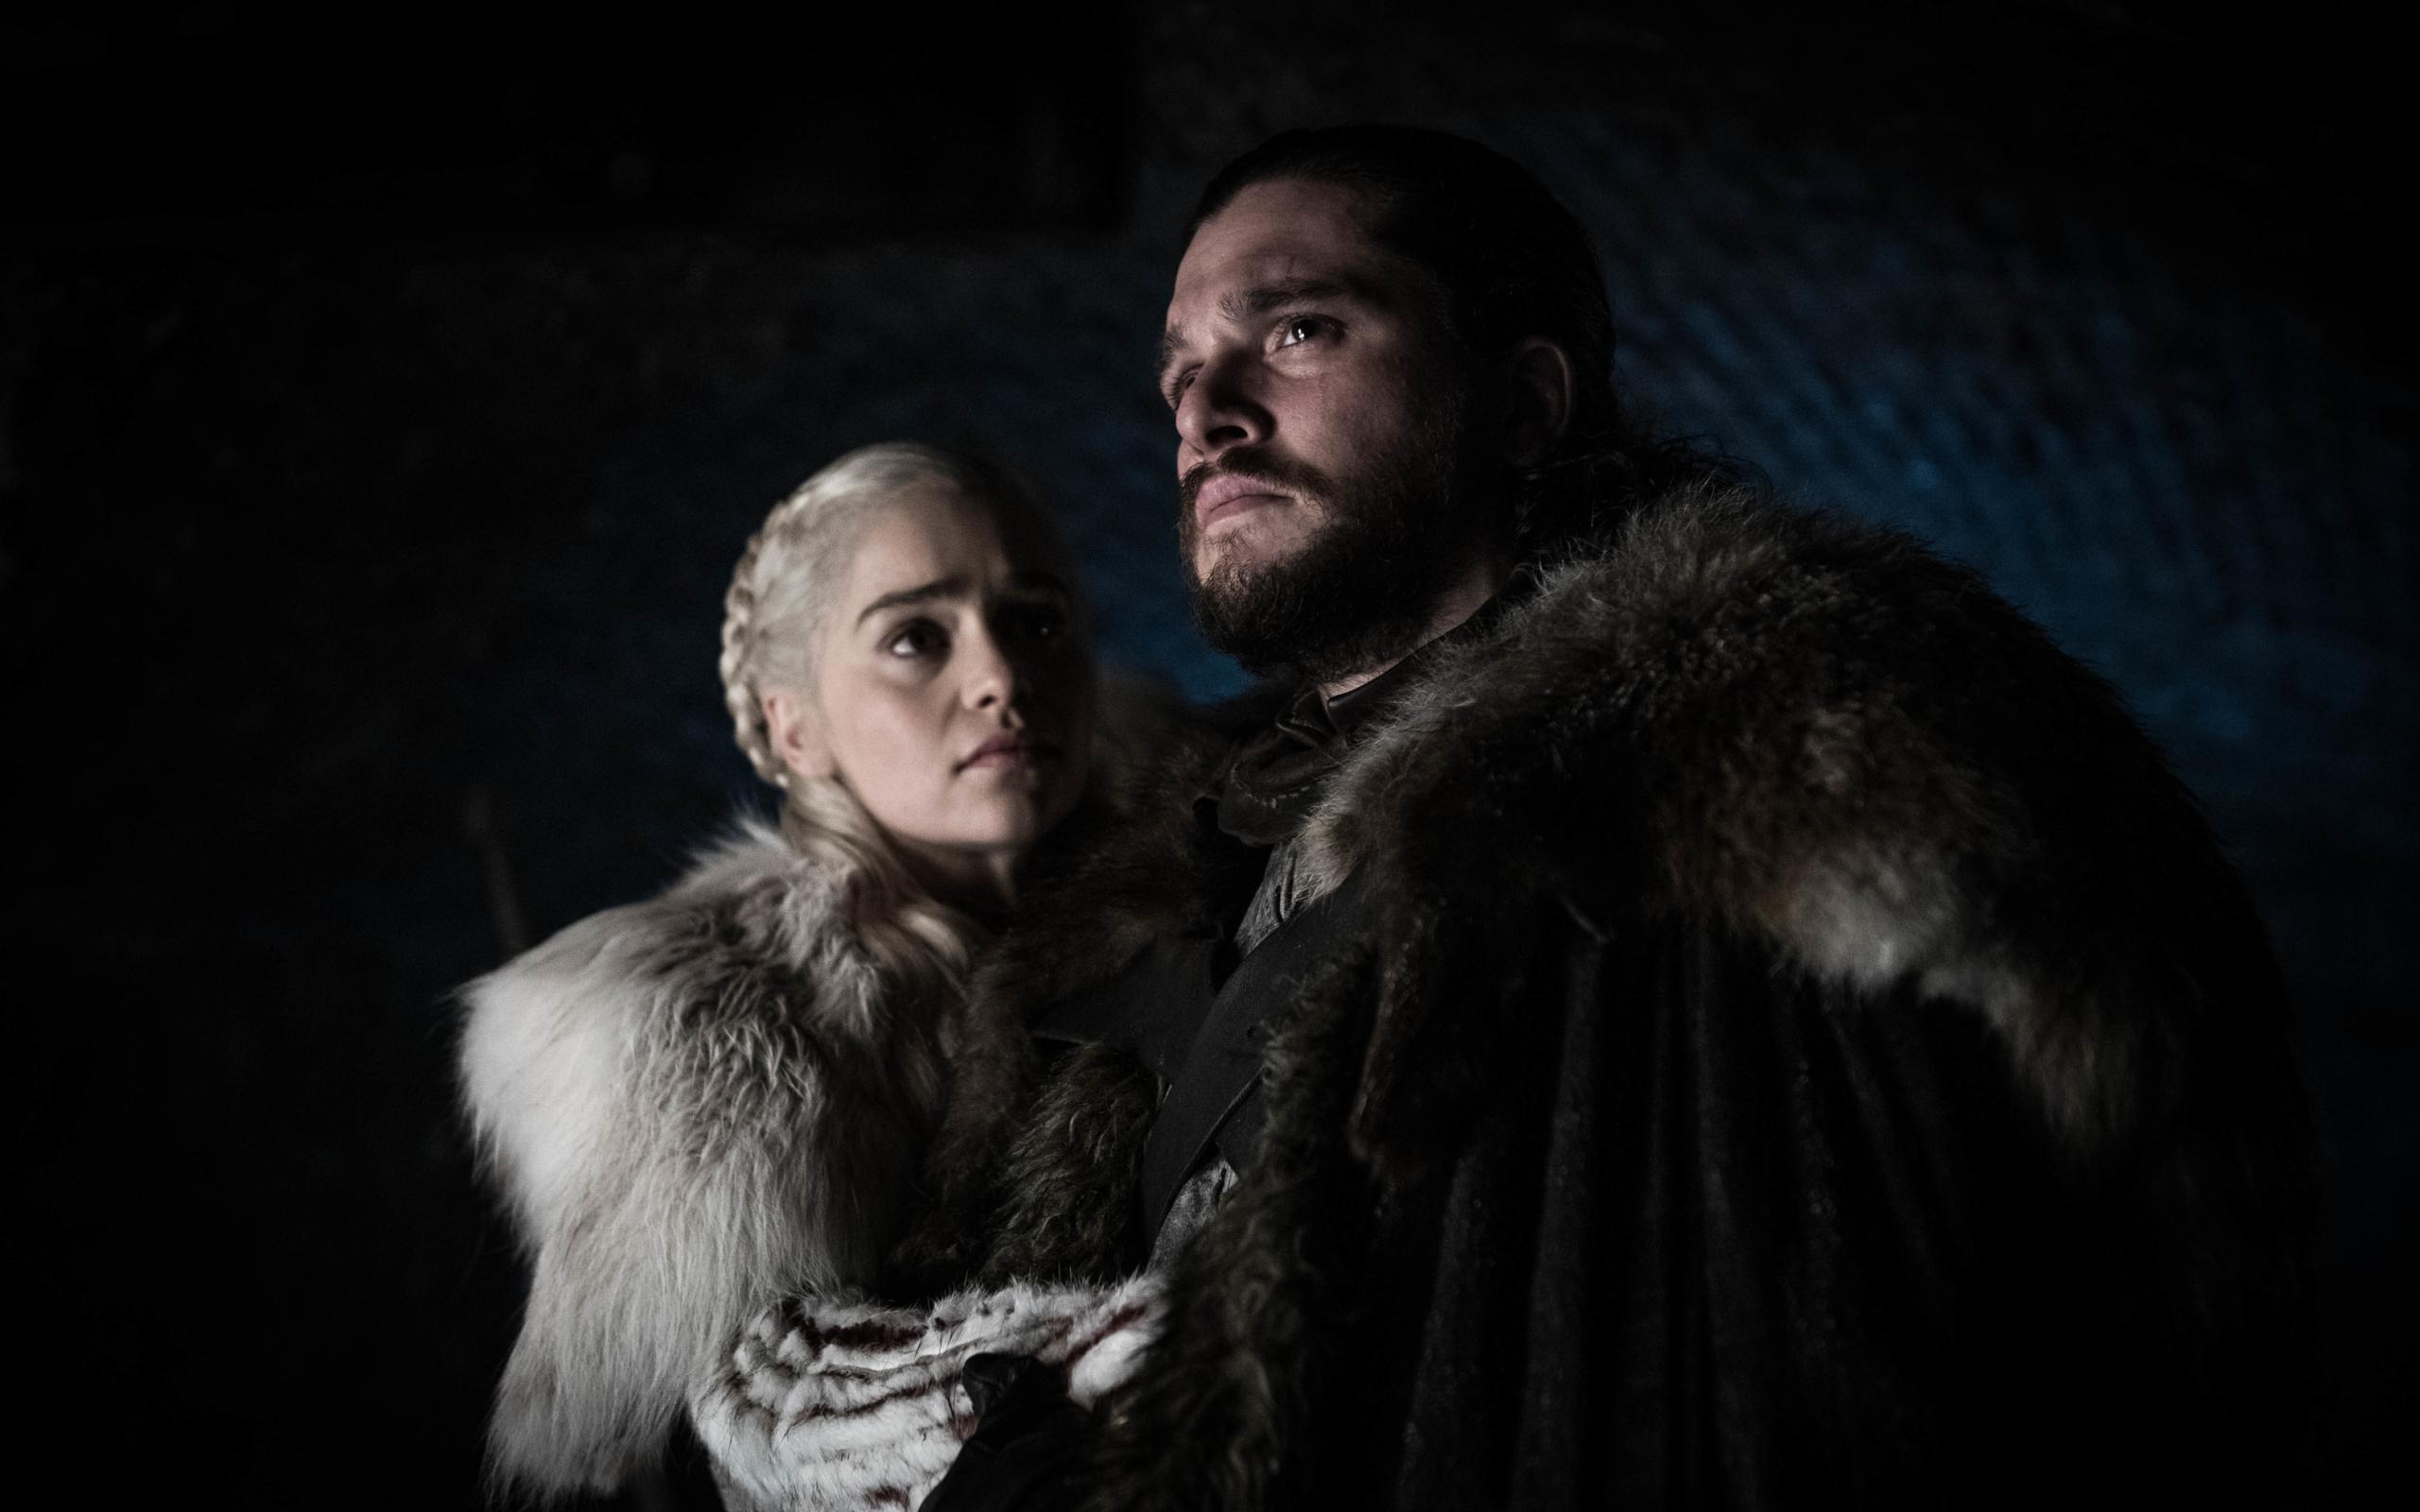 2560x1600 Game Of Thrones Season 8 Jon Snow And Daenerys